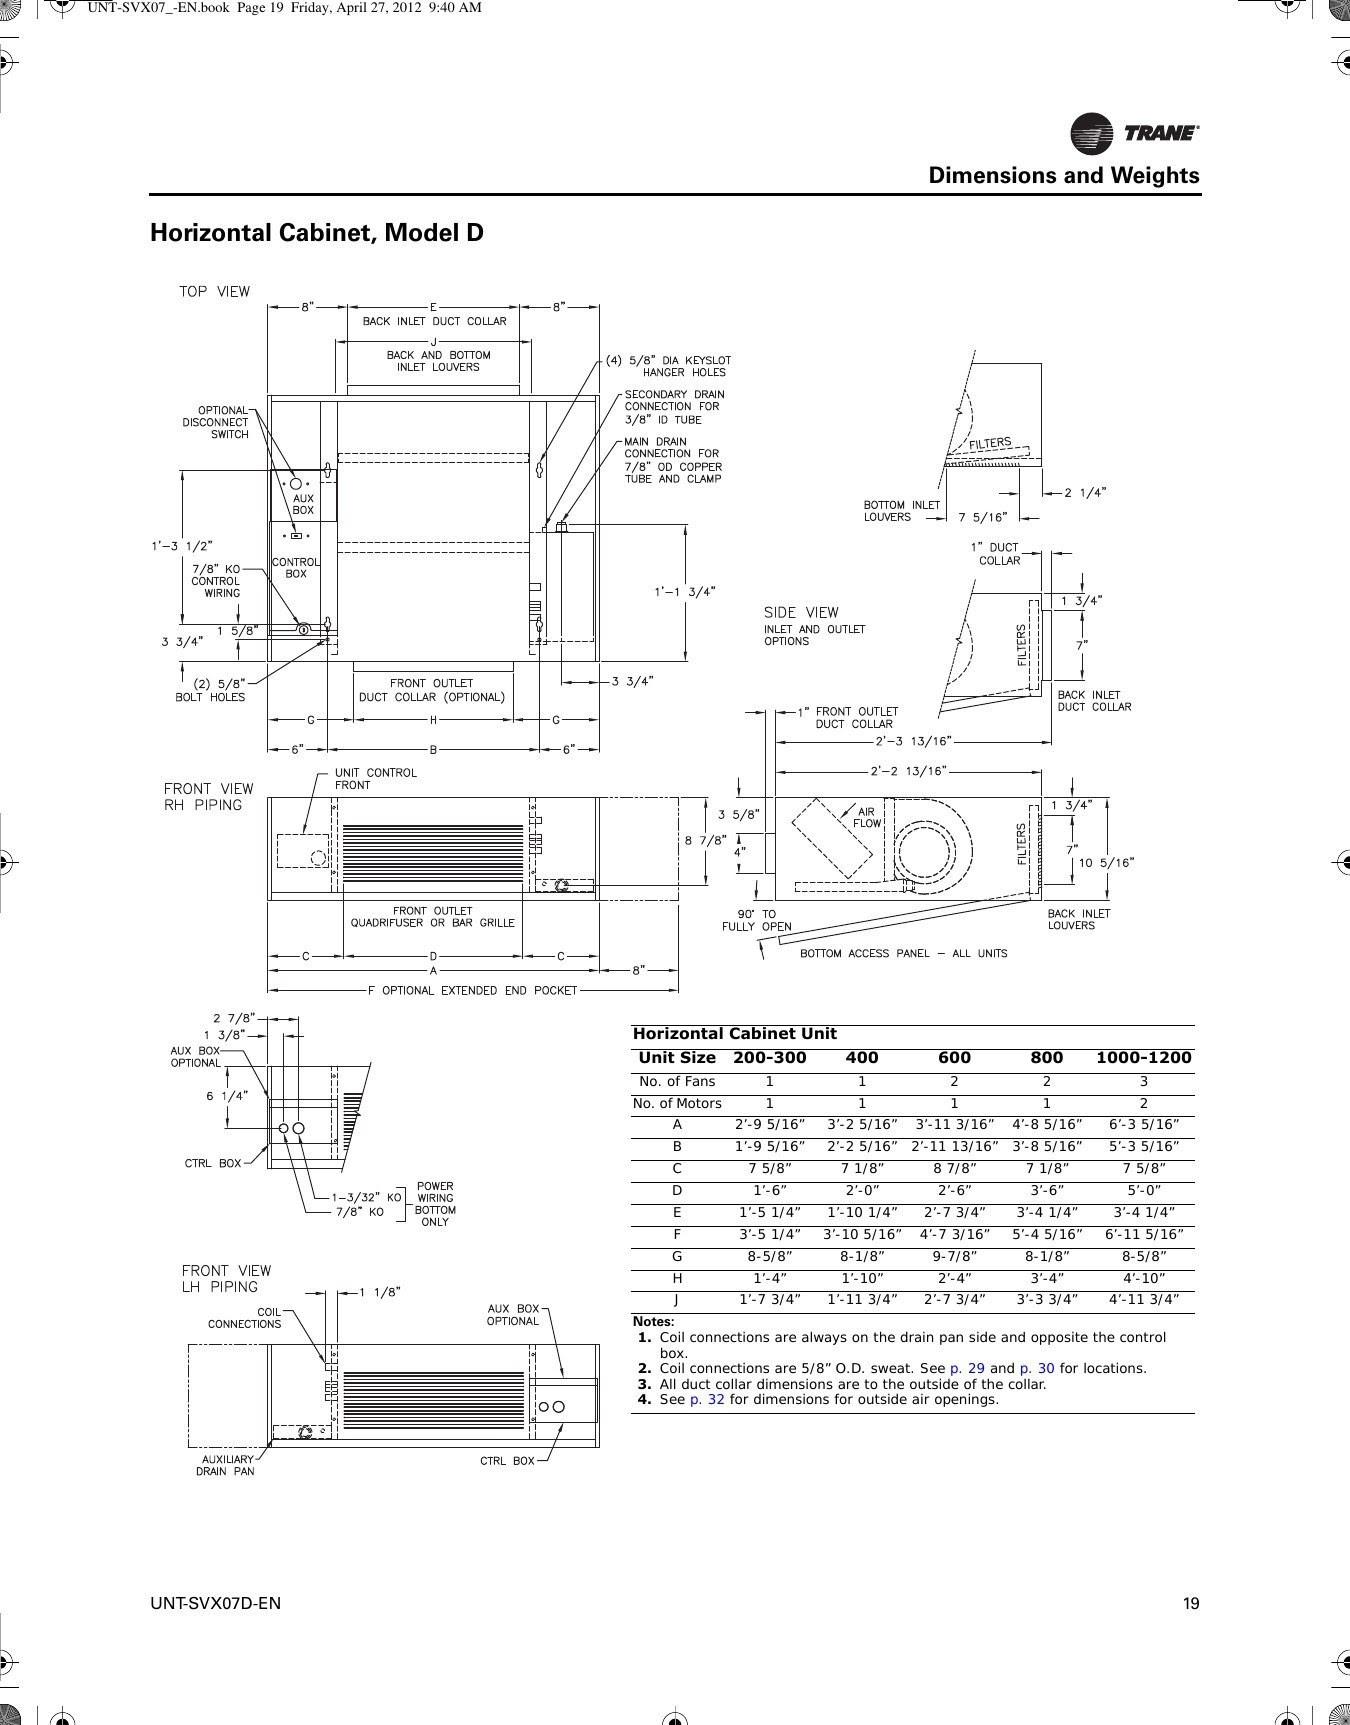 Pollak Trailer Plug Wiring Diagram - Wiring Diagram